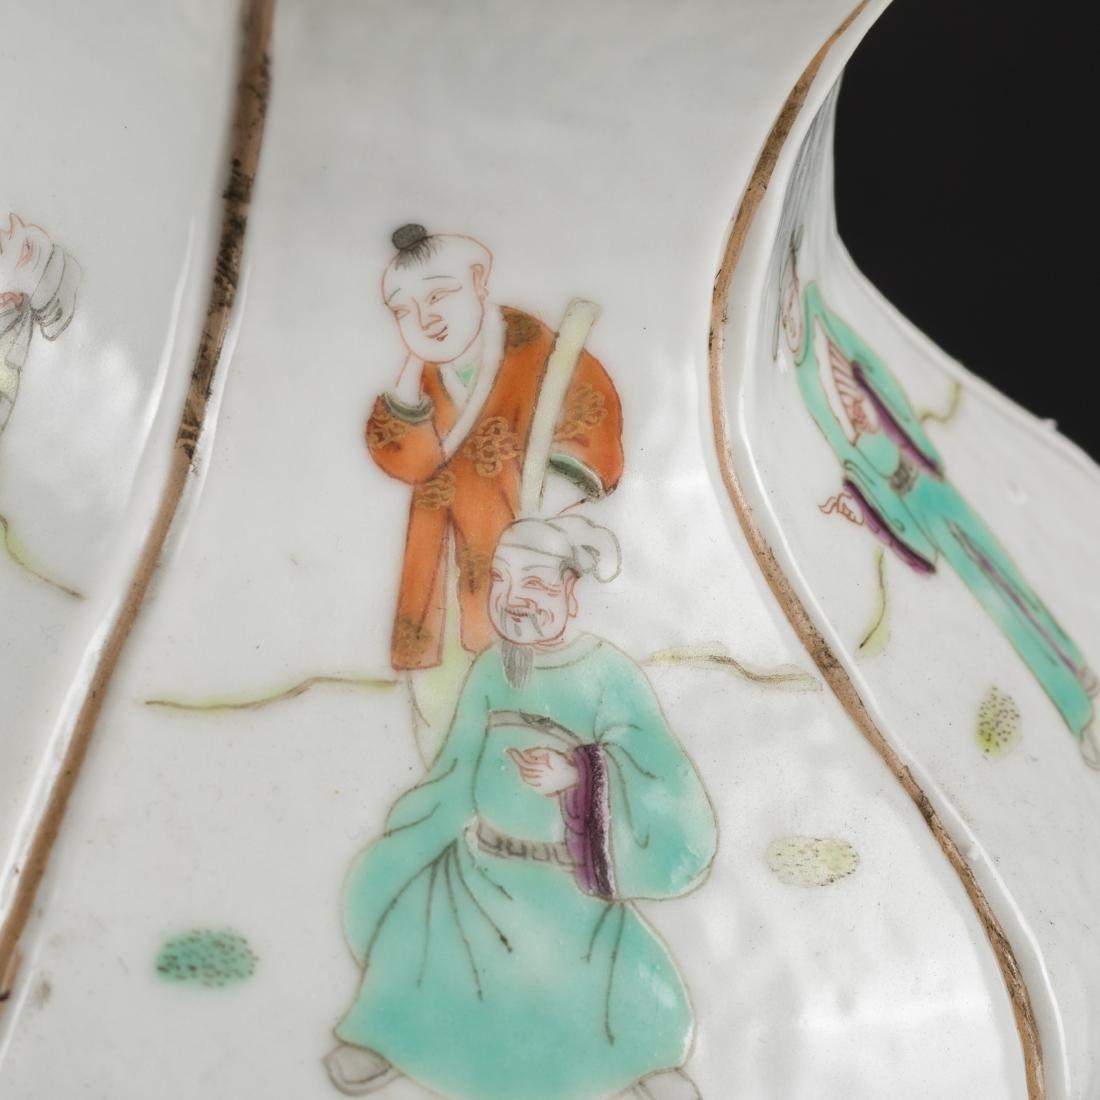 19th Antique Famille Rose Vase - 10